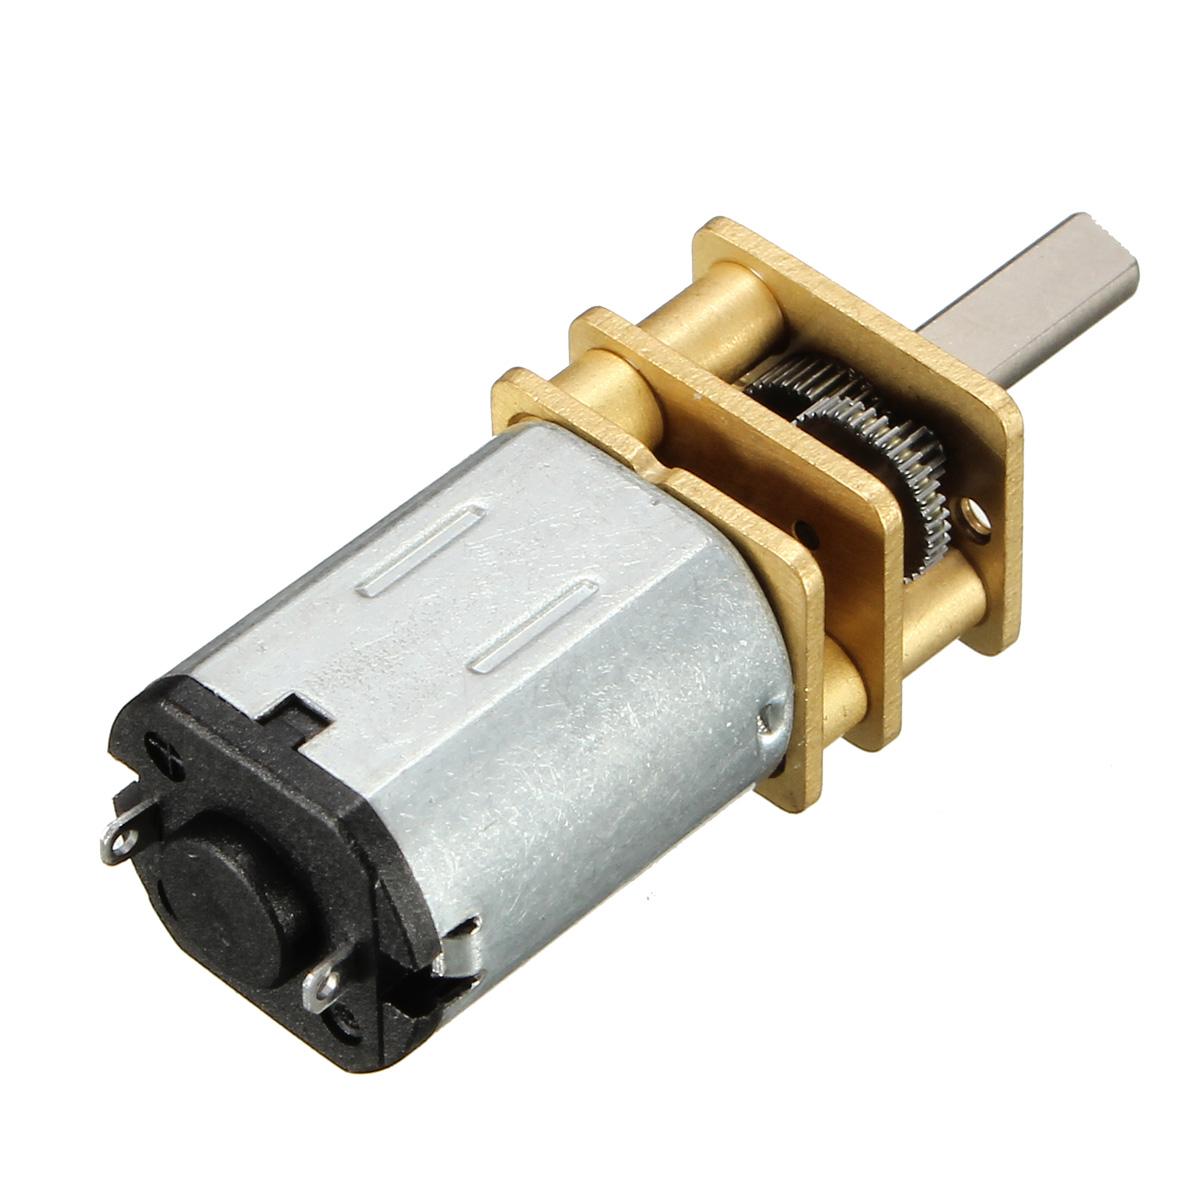 N20-3V-15 Rpm Micro Metal Gear-box DC Motor